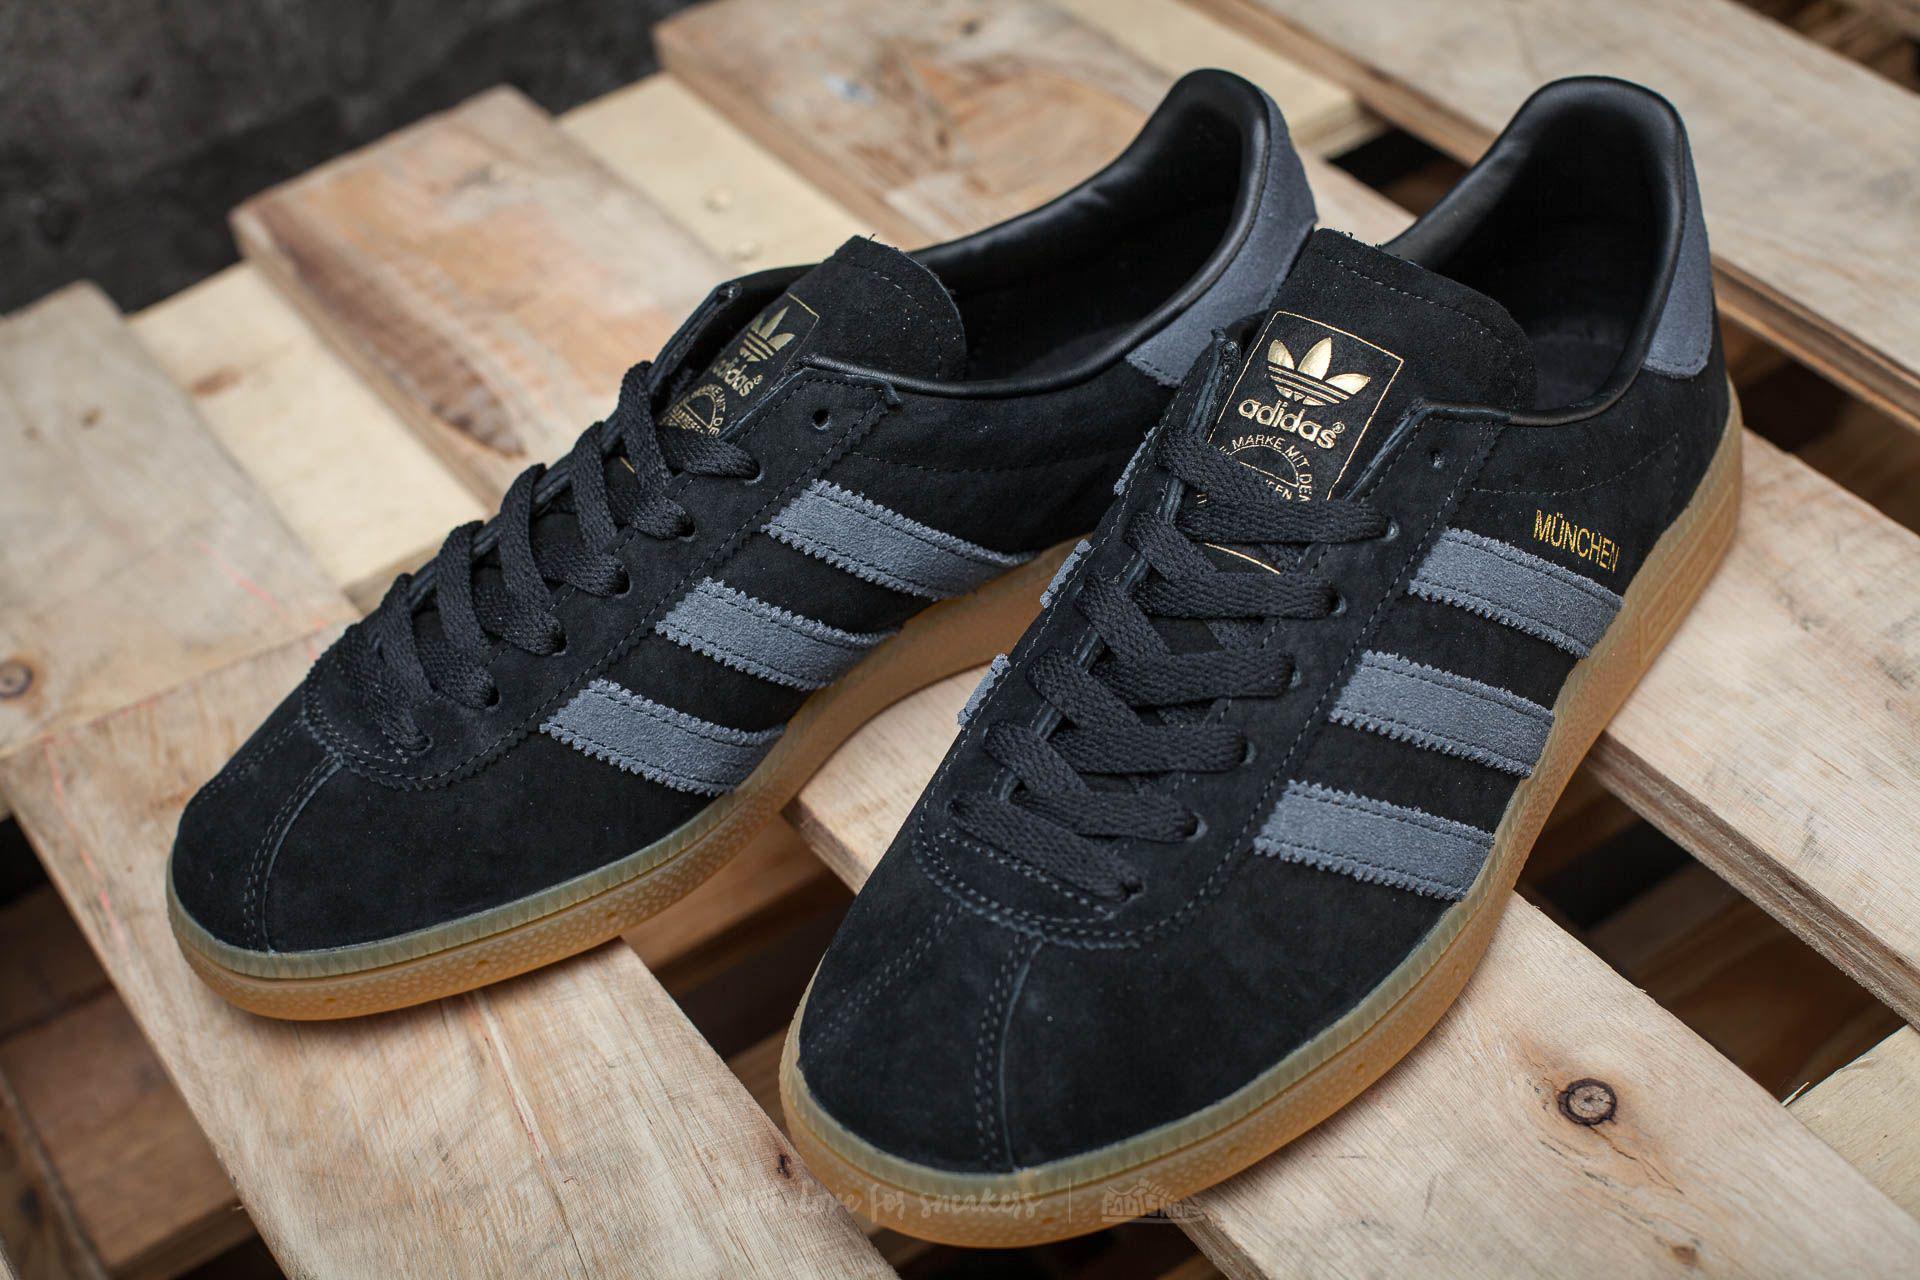 quality design 06830 c8fc8 Lyst - adidas Originals Adidas Munchen Core Black Dark Grey